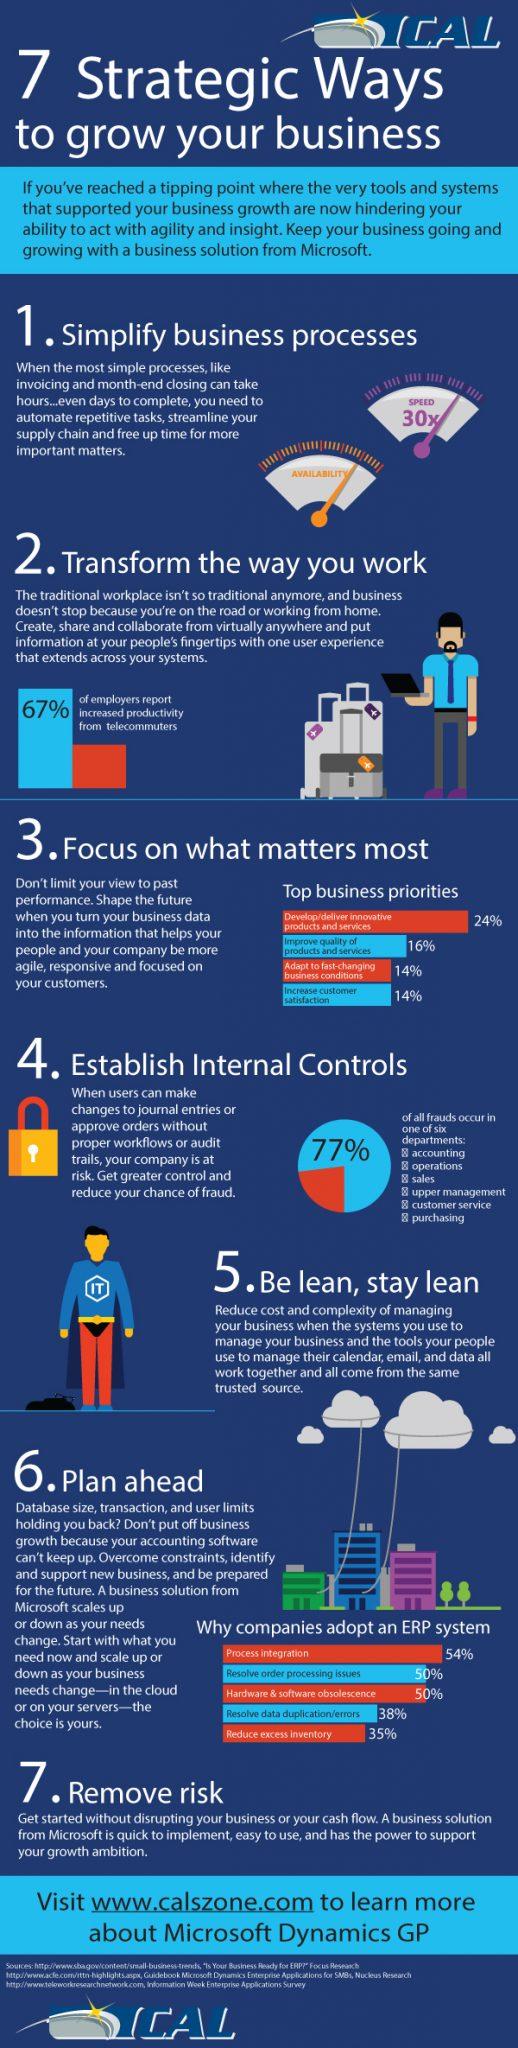 Infographic: 7 Strategic Ways to Grow Your Business With Microsoft Dynamics GP